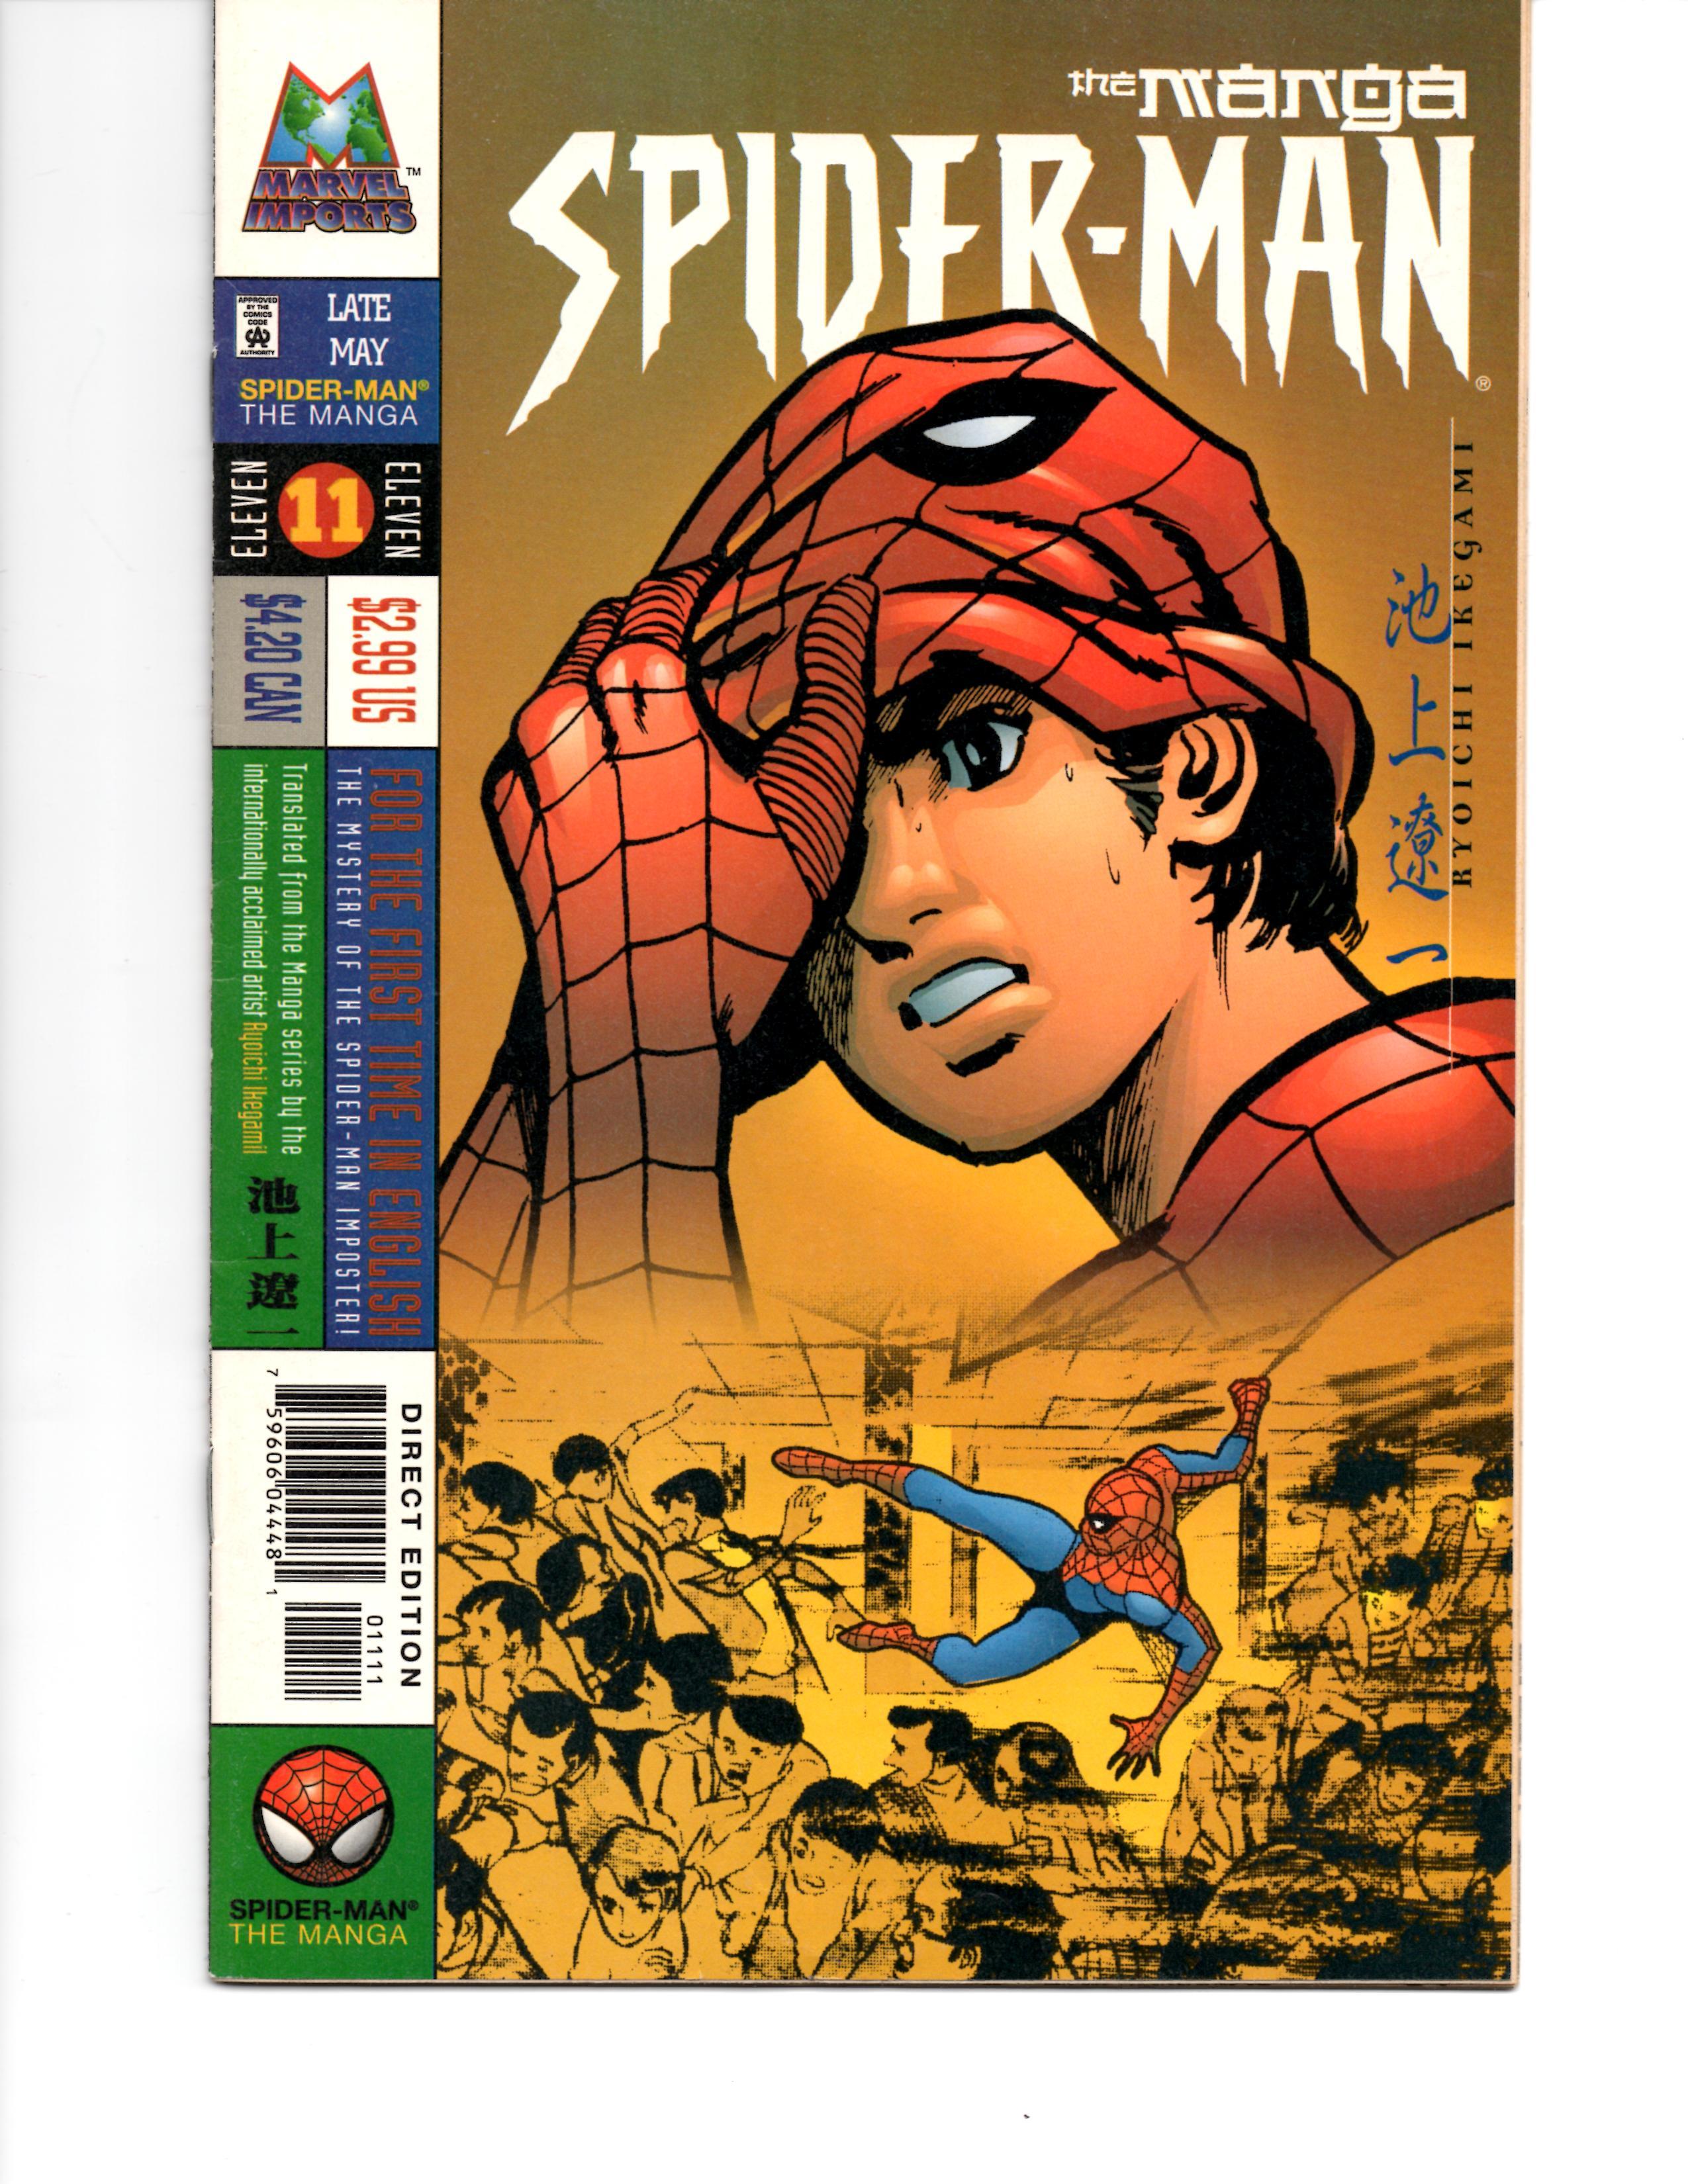 Spider-Man: The Manga Vol 1 11